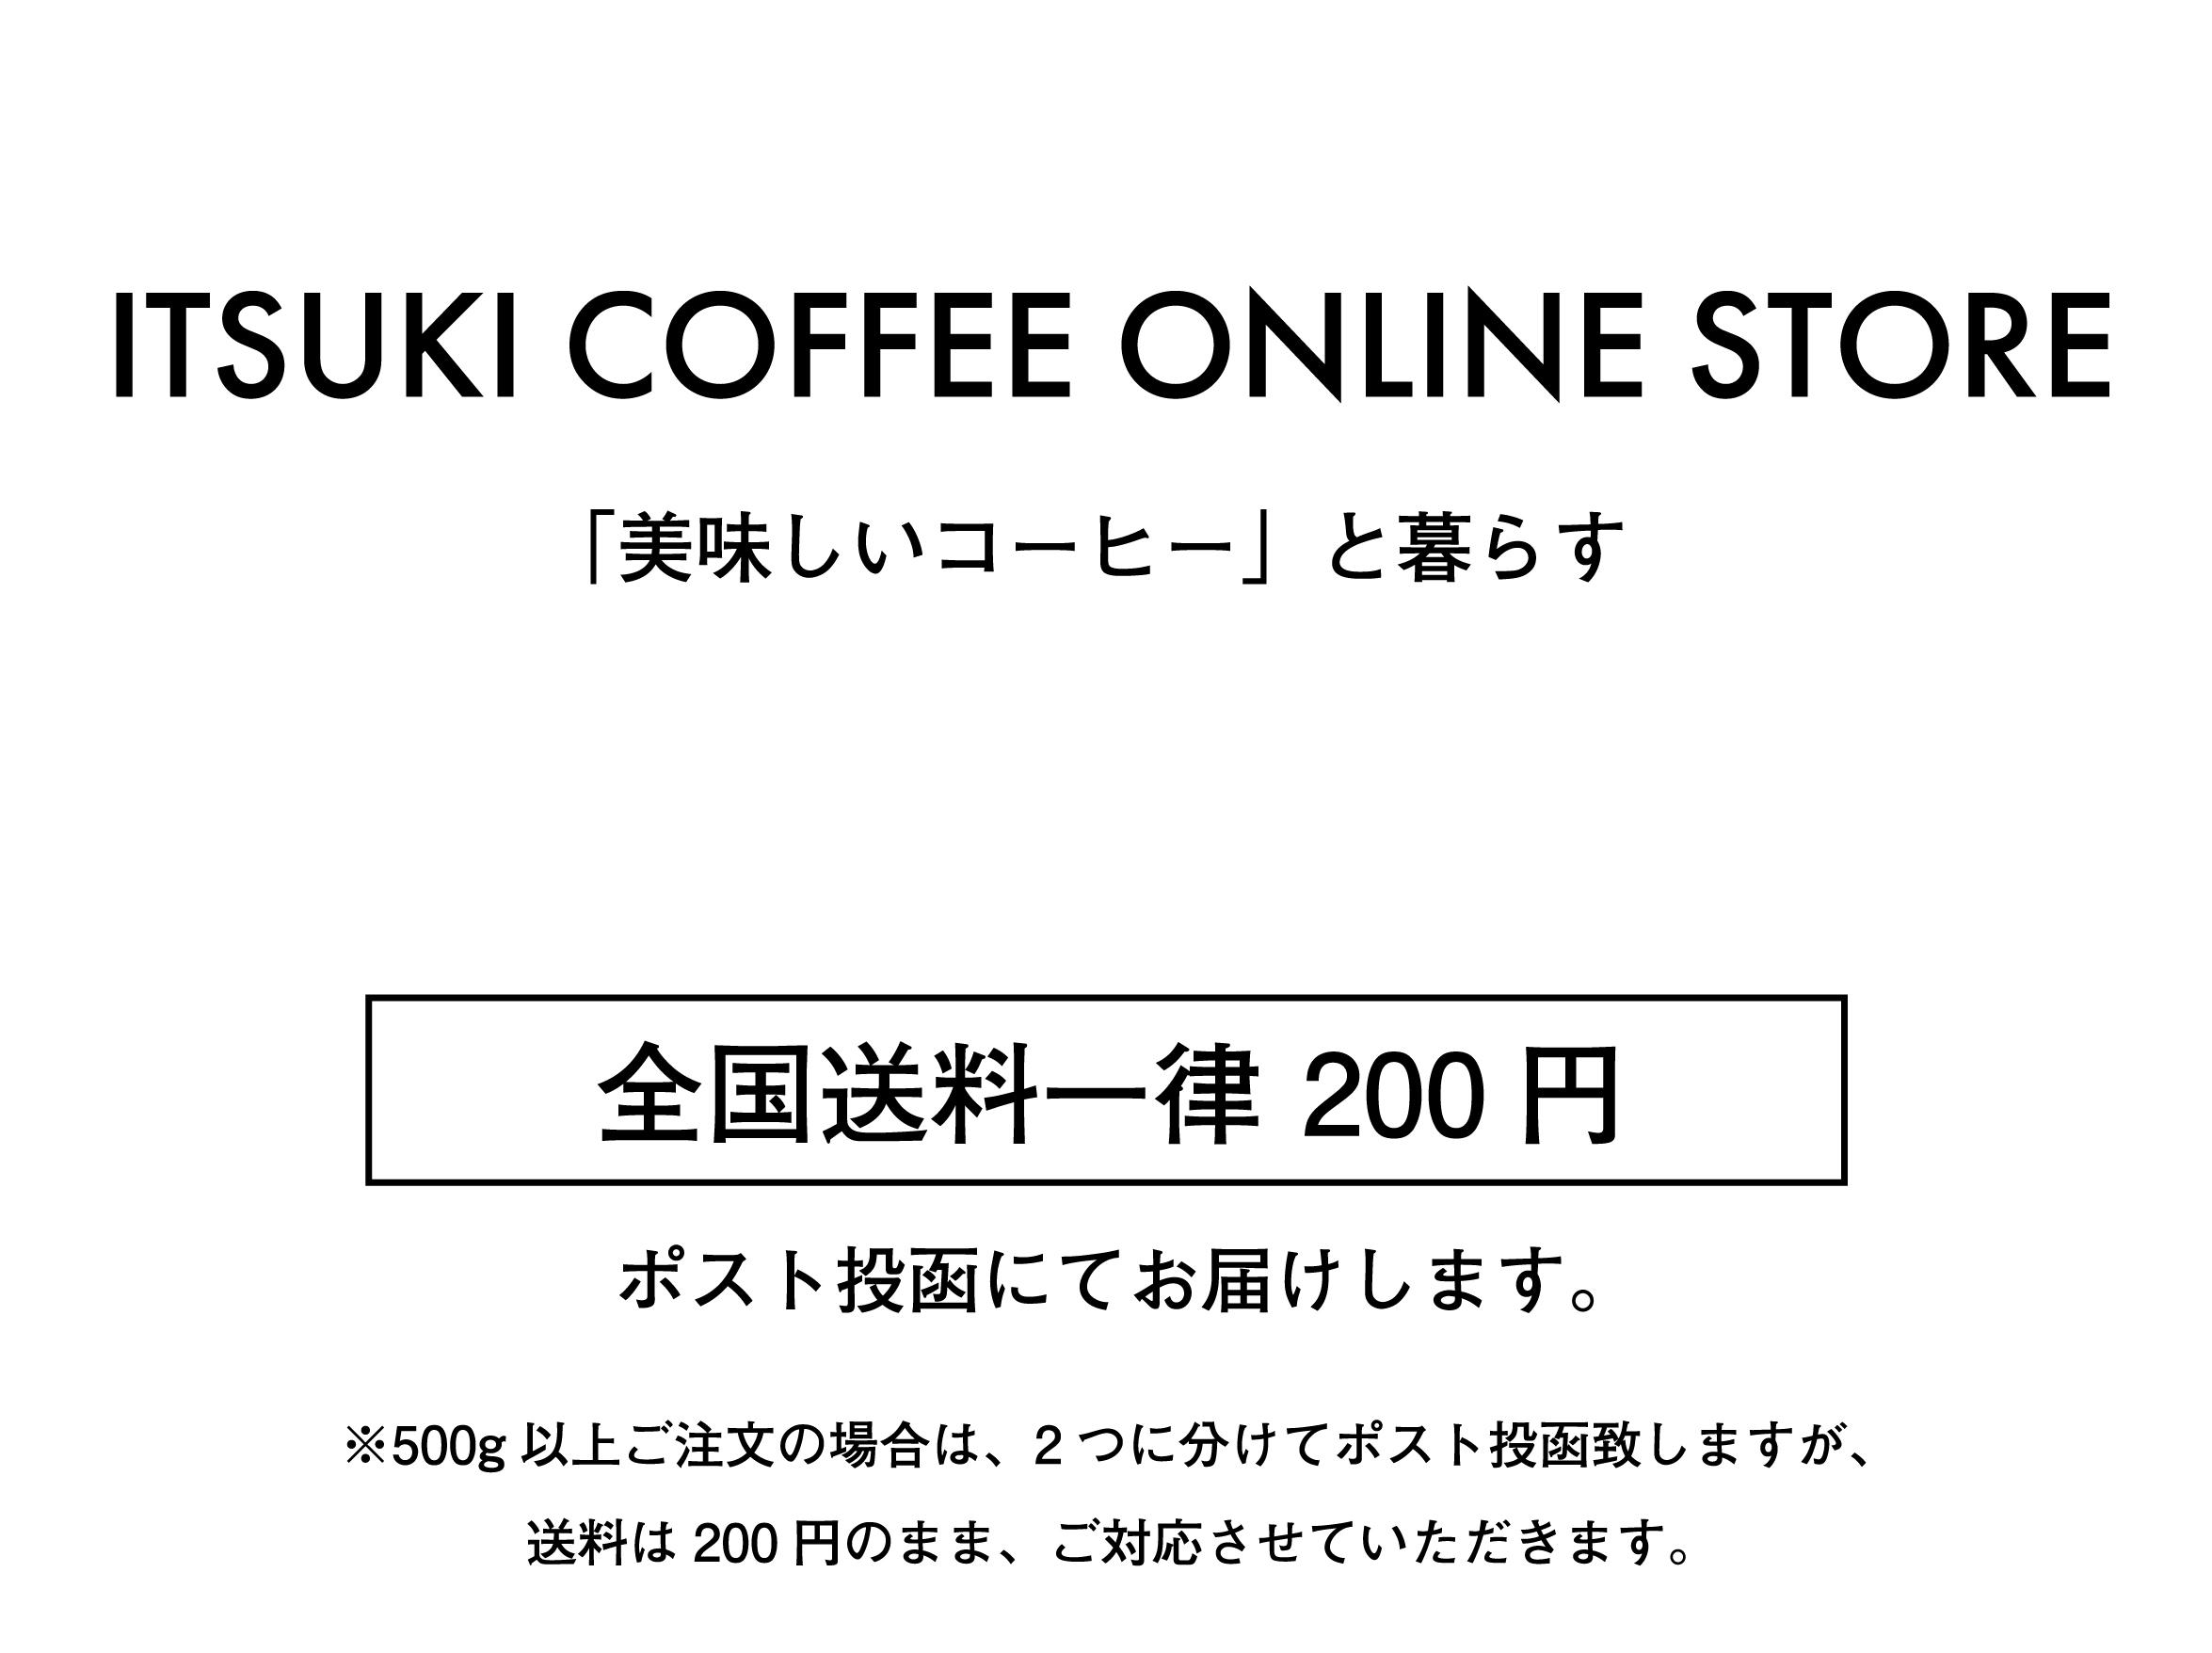 ITSUKI COFFEE ONLINE STORE